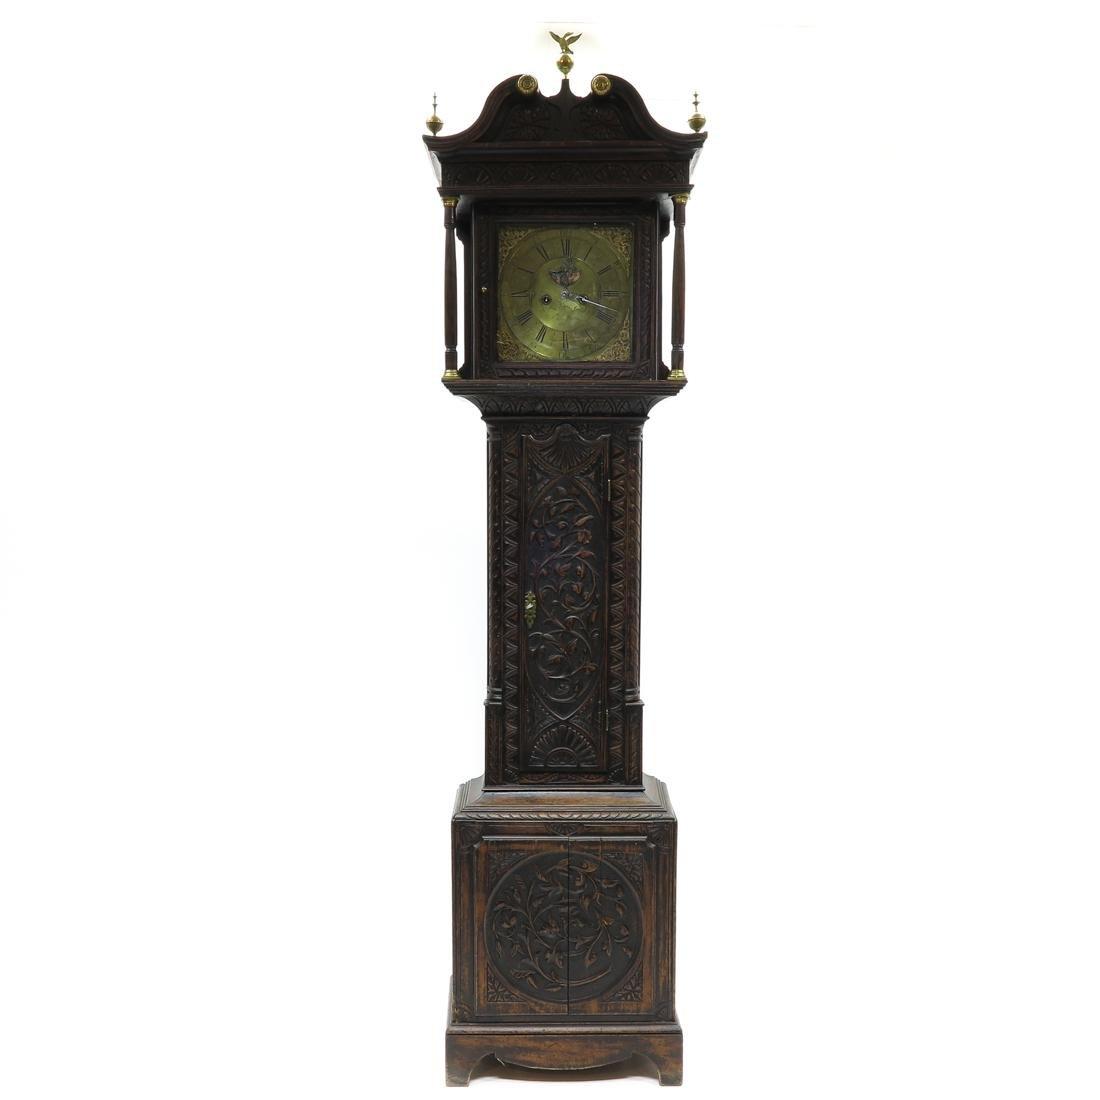 18th / 19th Century English Standing Clock